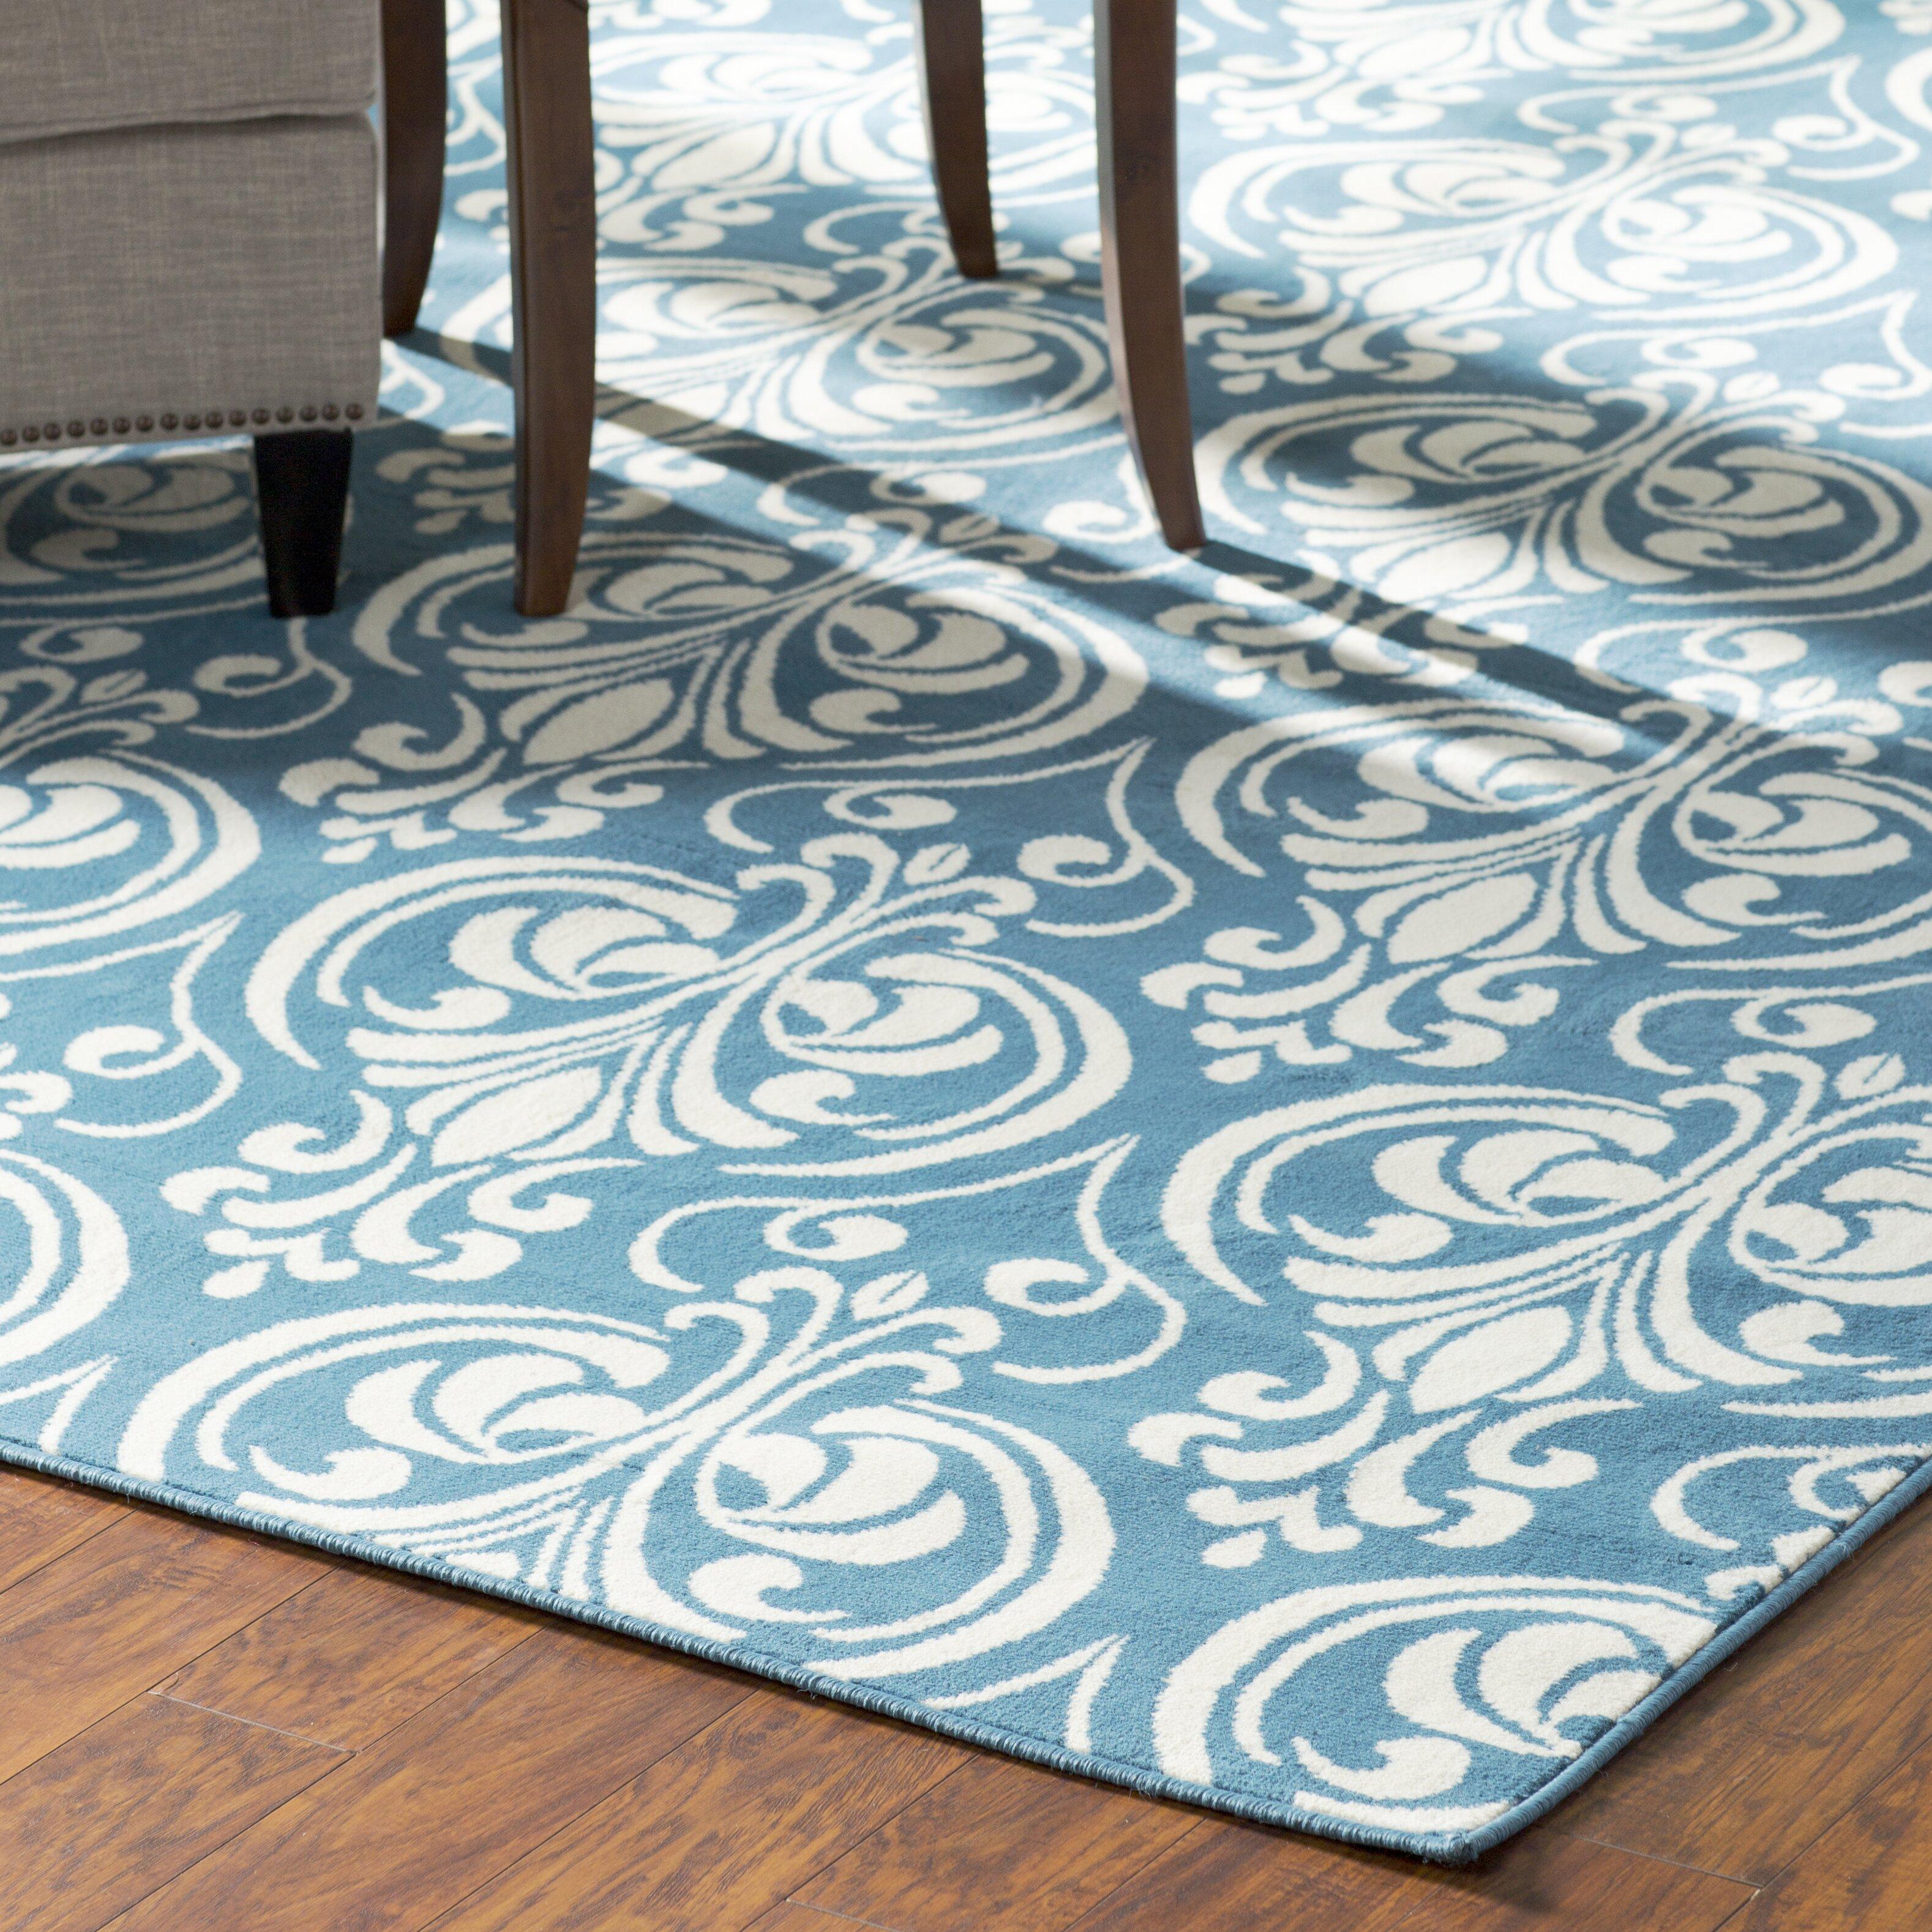 Andover Mills Pearl Blue Indoor Outdoor Area Rug & Reviews